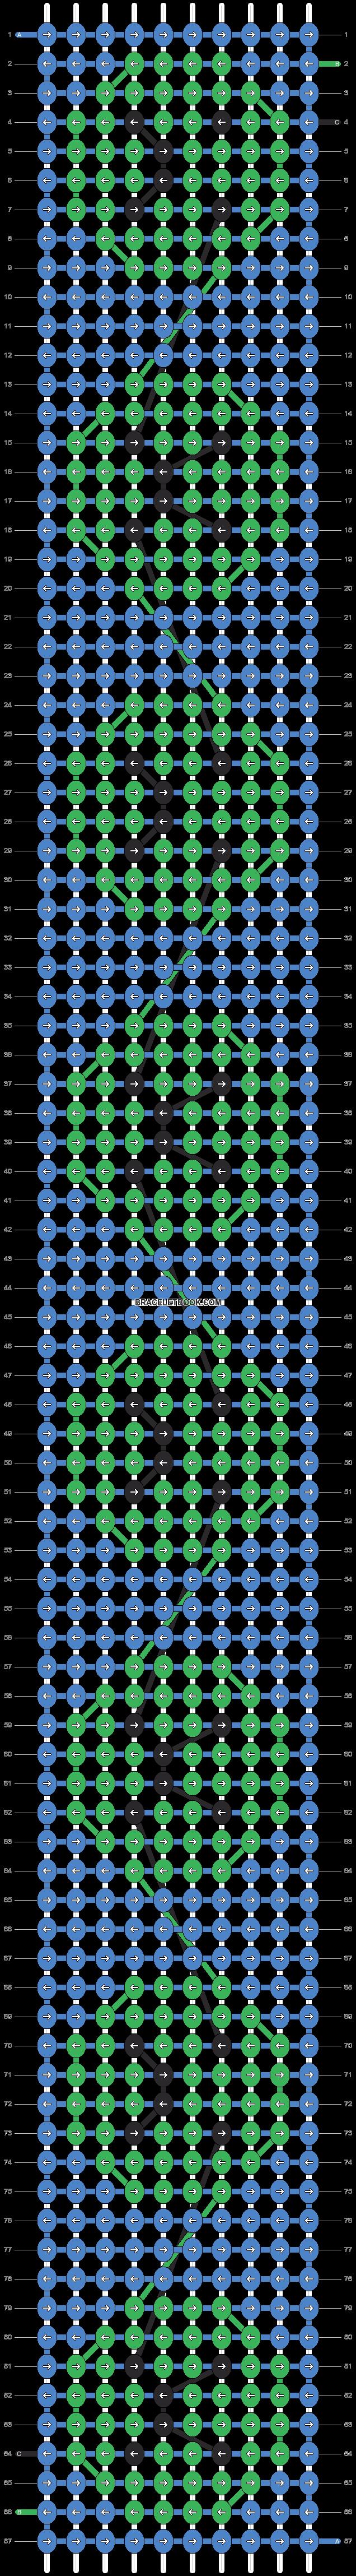 Alpha pattern #86854 variation #157029 pattern